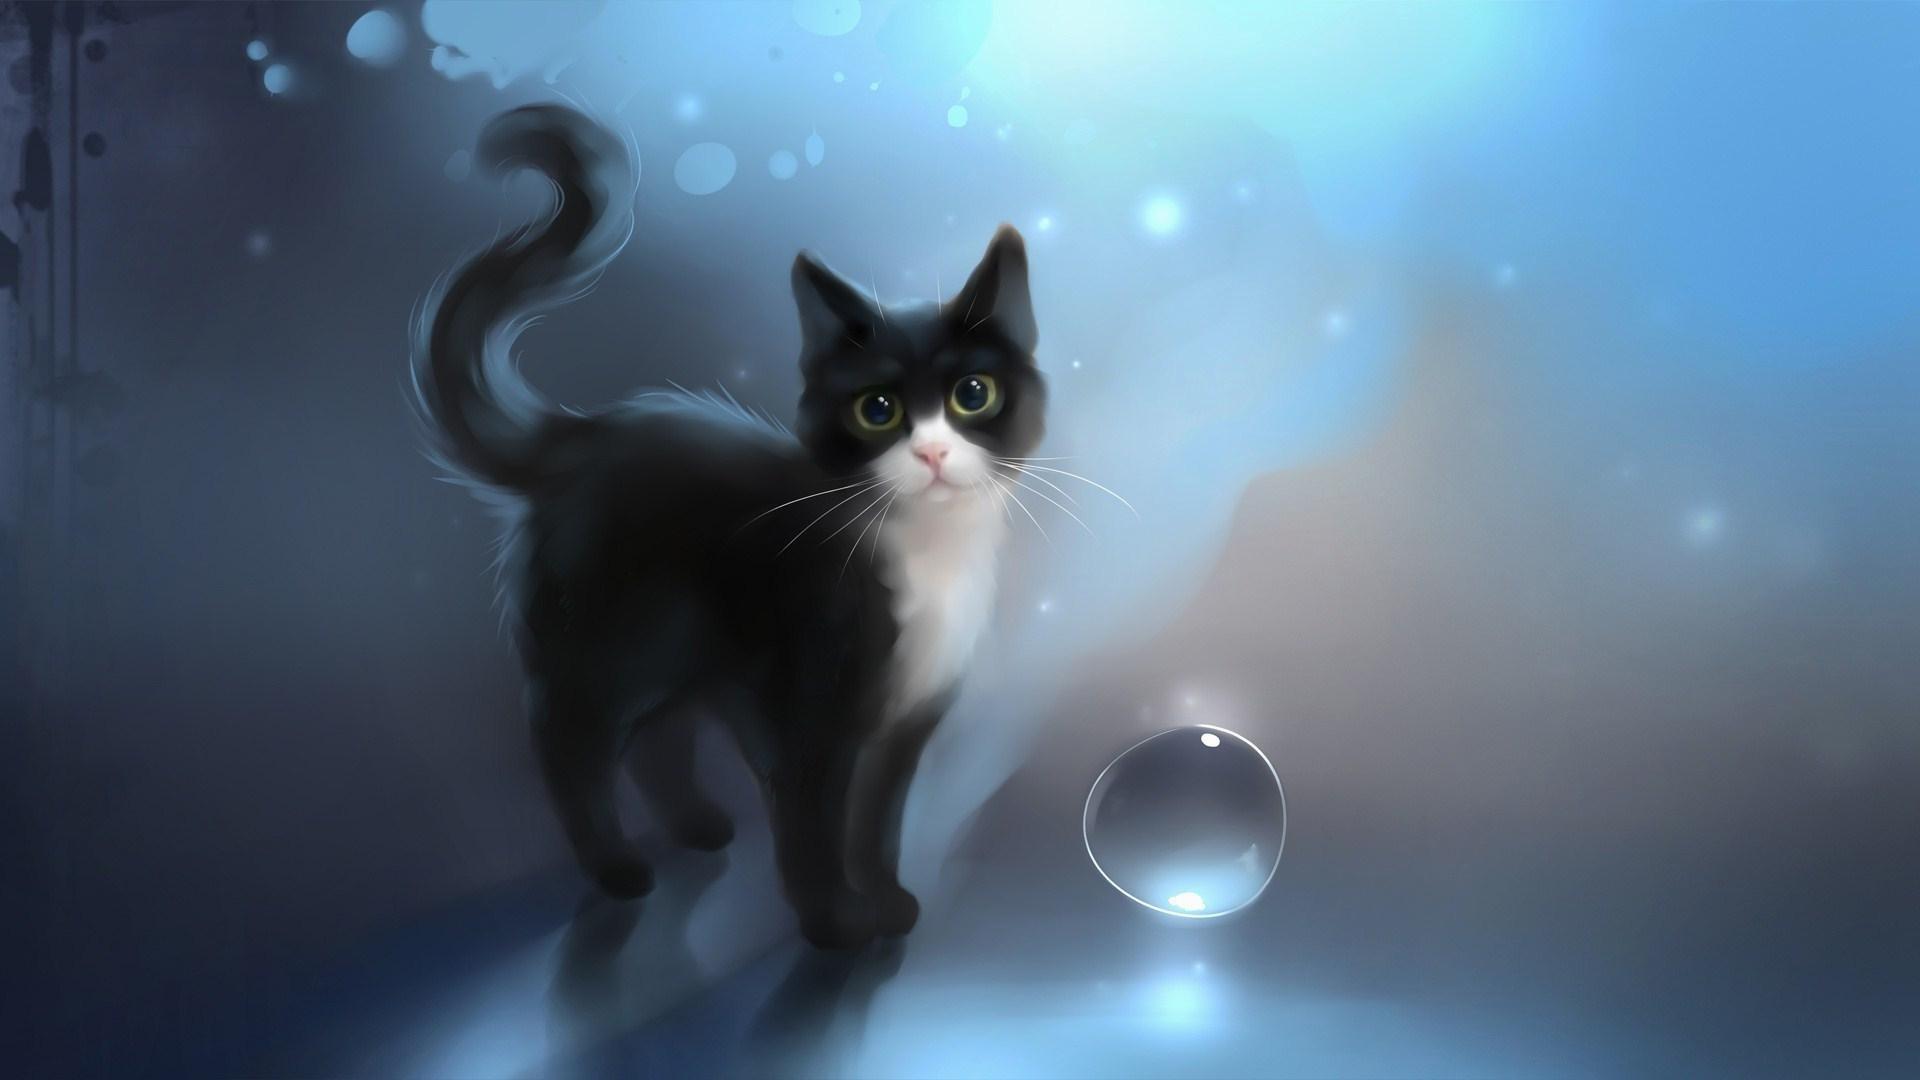 wallpaper.wiki-Download-Free-Anime-Cat-Wallpaper-PIC-